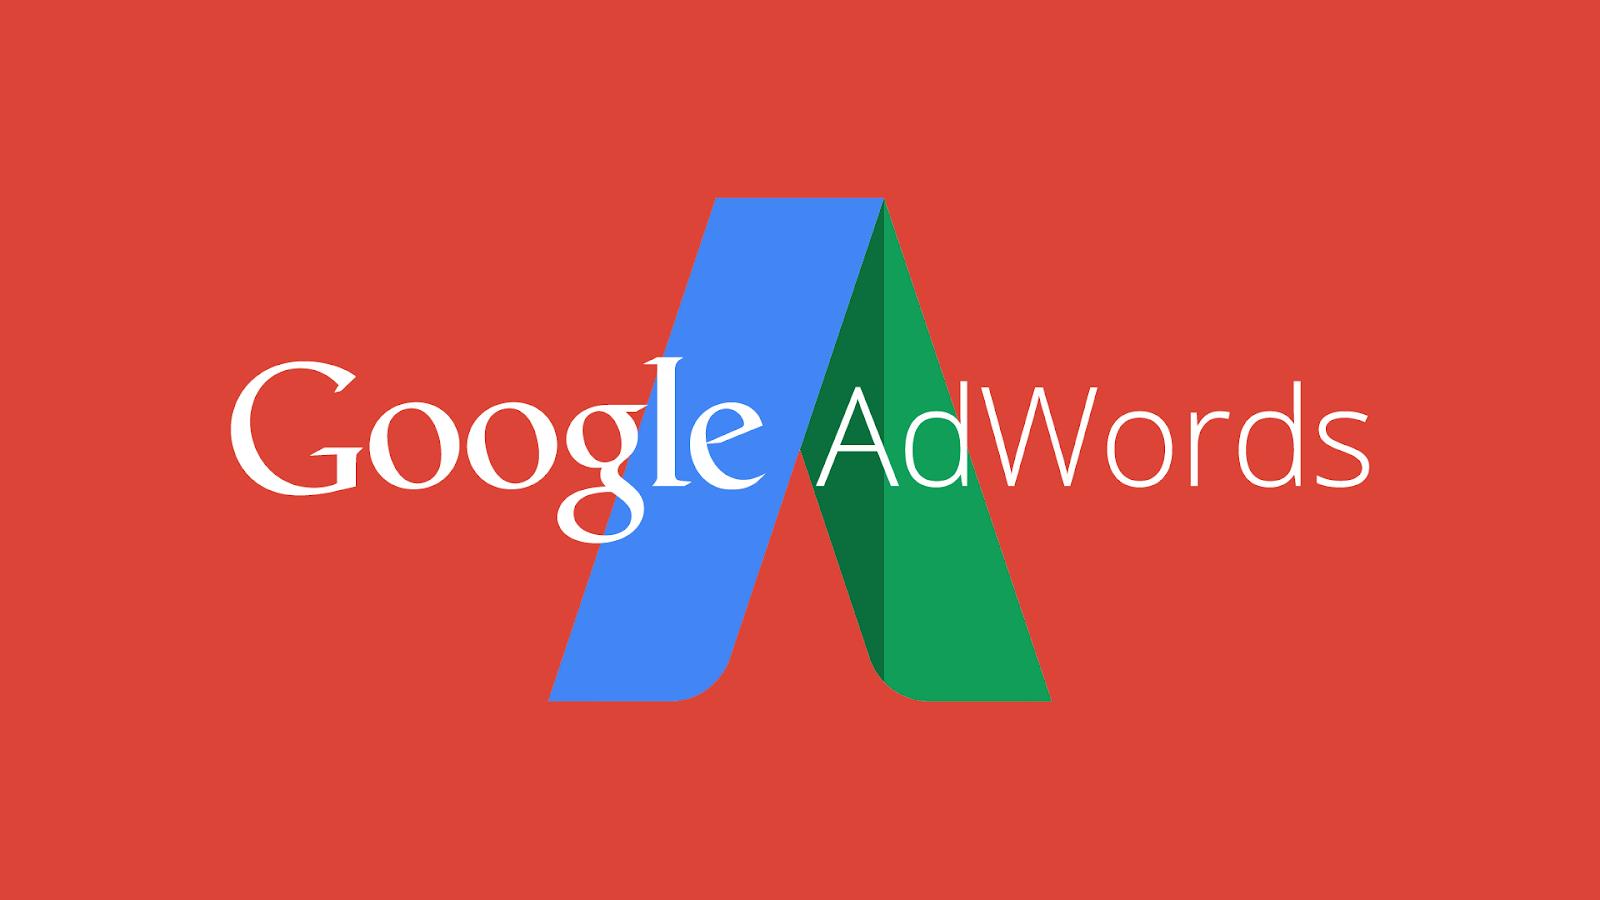 Google Adwords Nedir? Reklam Modelleri Nelerdir? - Vargonen Blog % %